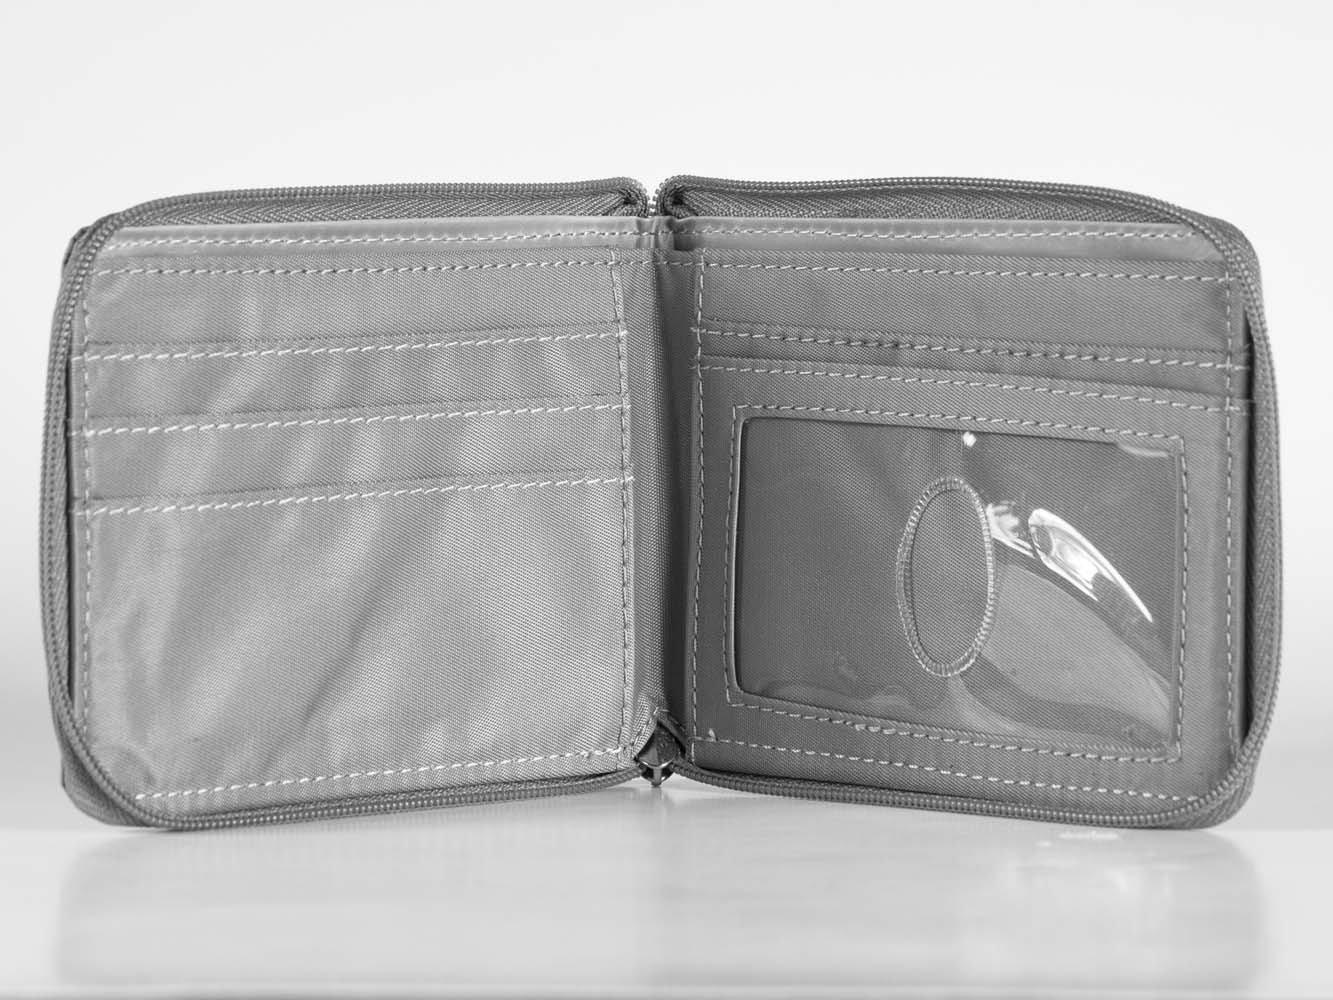 Big Skinny Mens Zippered Bi-Fold Slim Wallet, Holds Up to ...